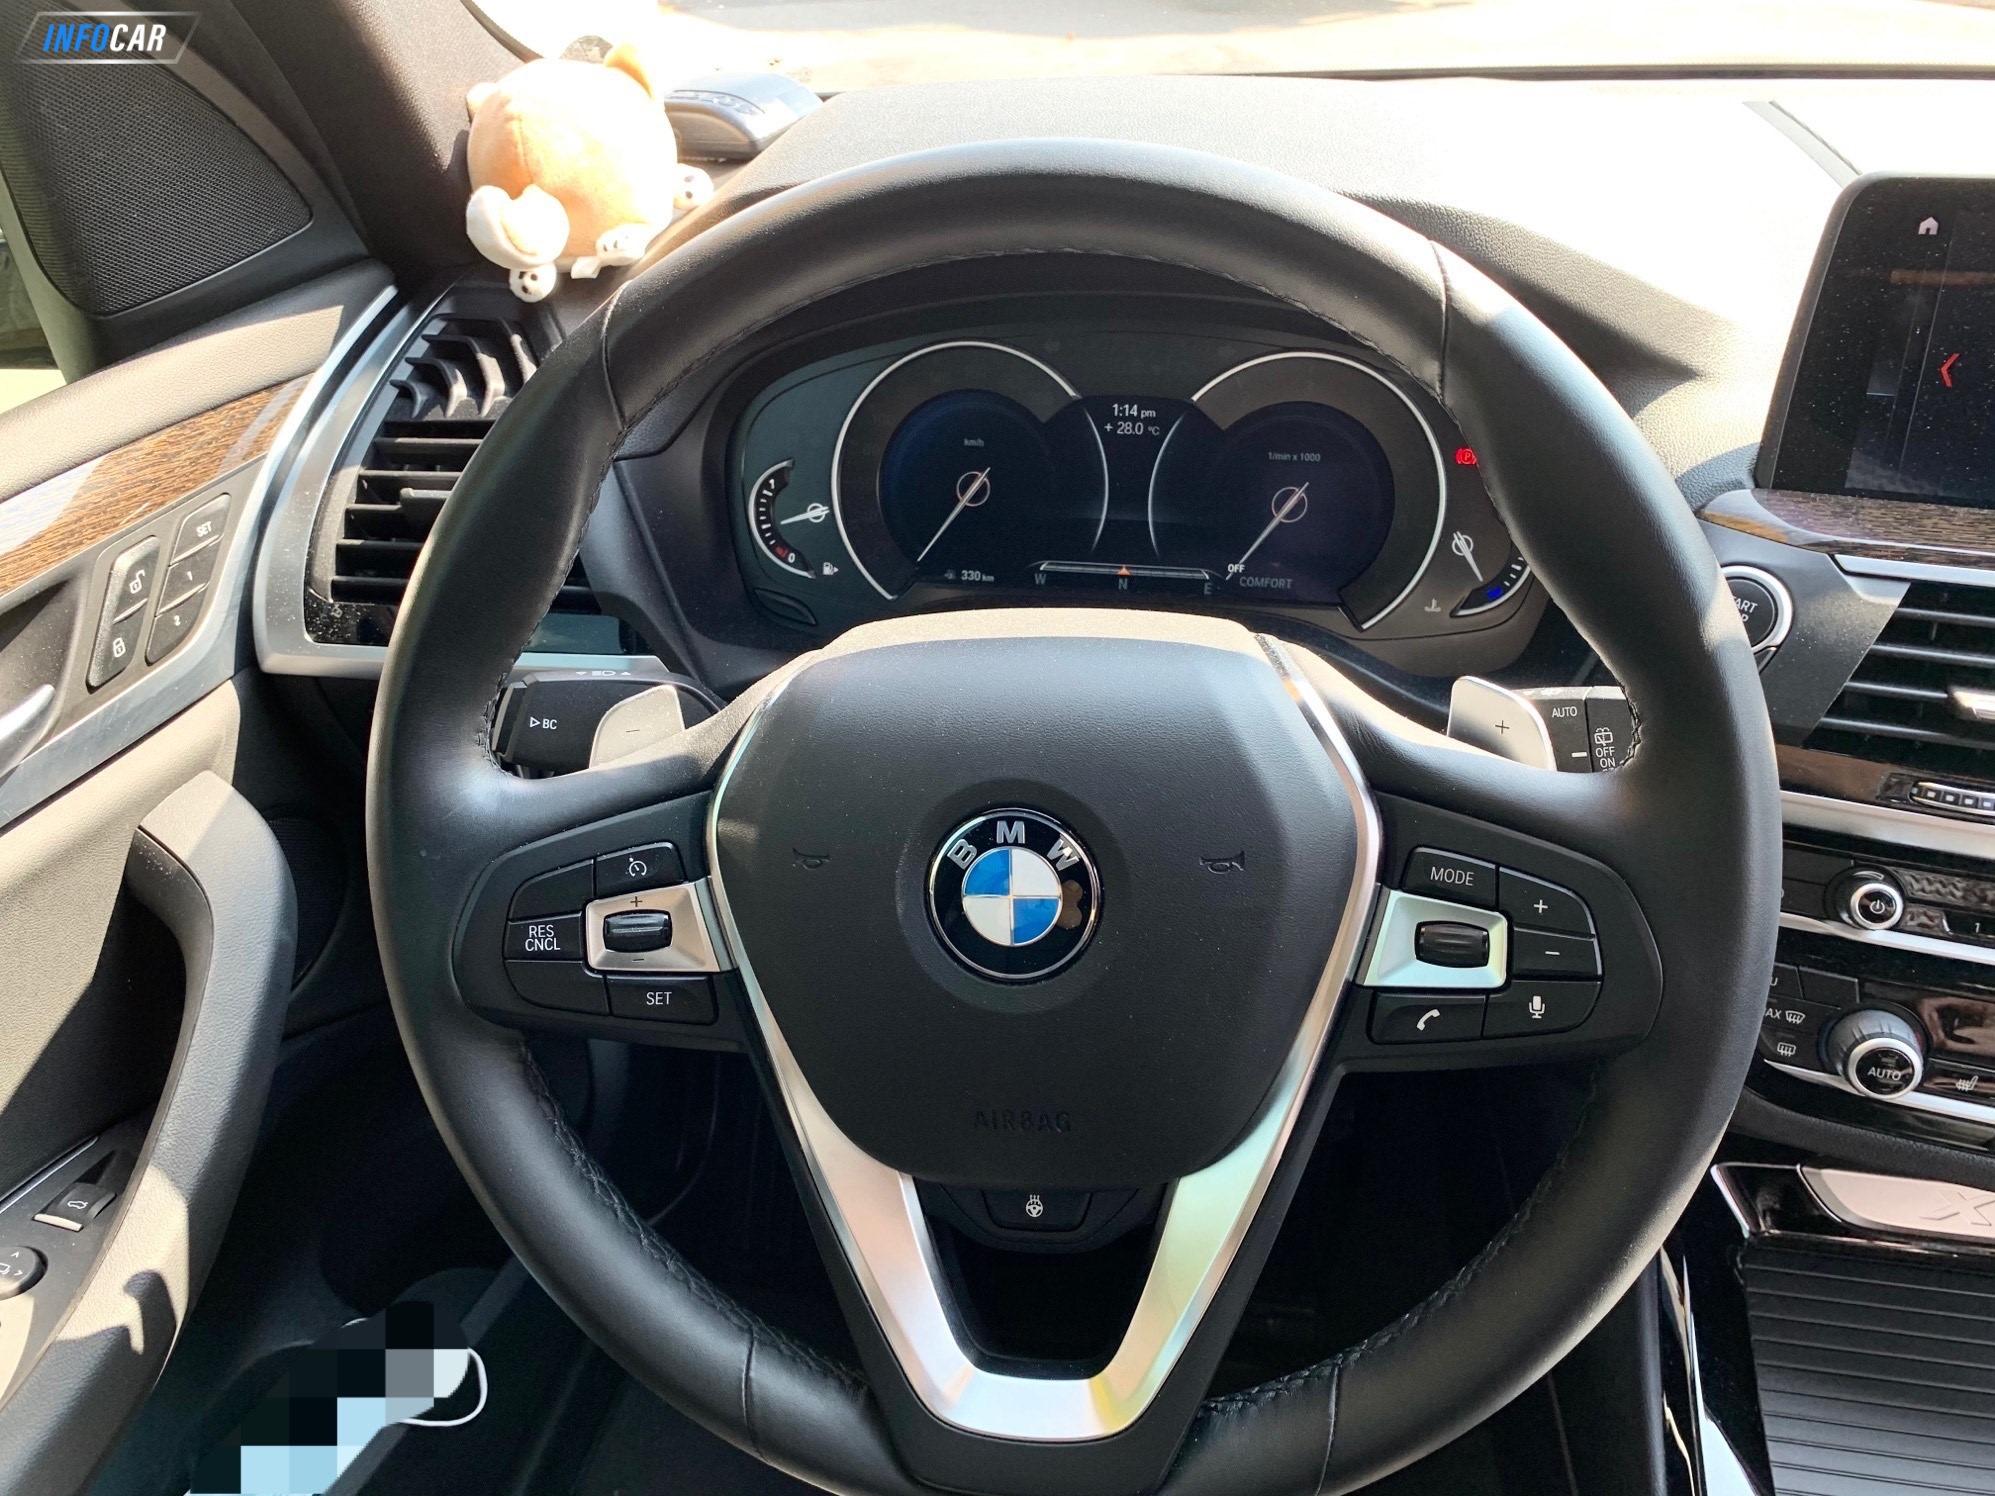 2019 BMW X3 xDrive30i - INFOCAR - Toronto's Most Comprehensive New and Used Auto Trading Platform